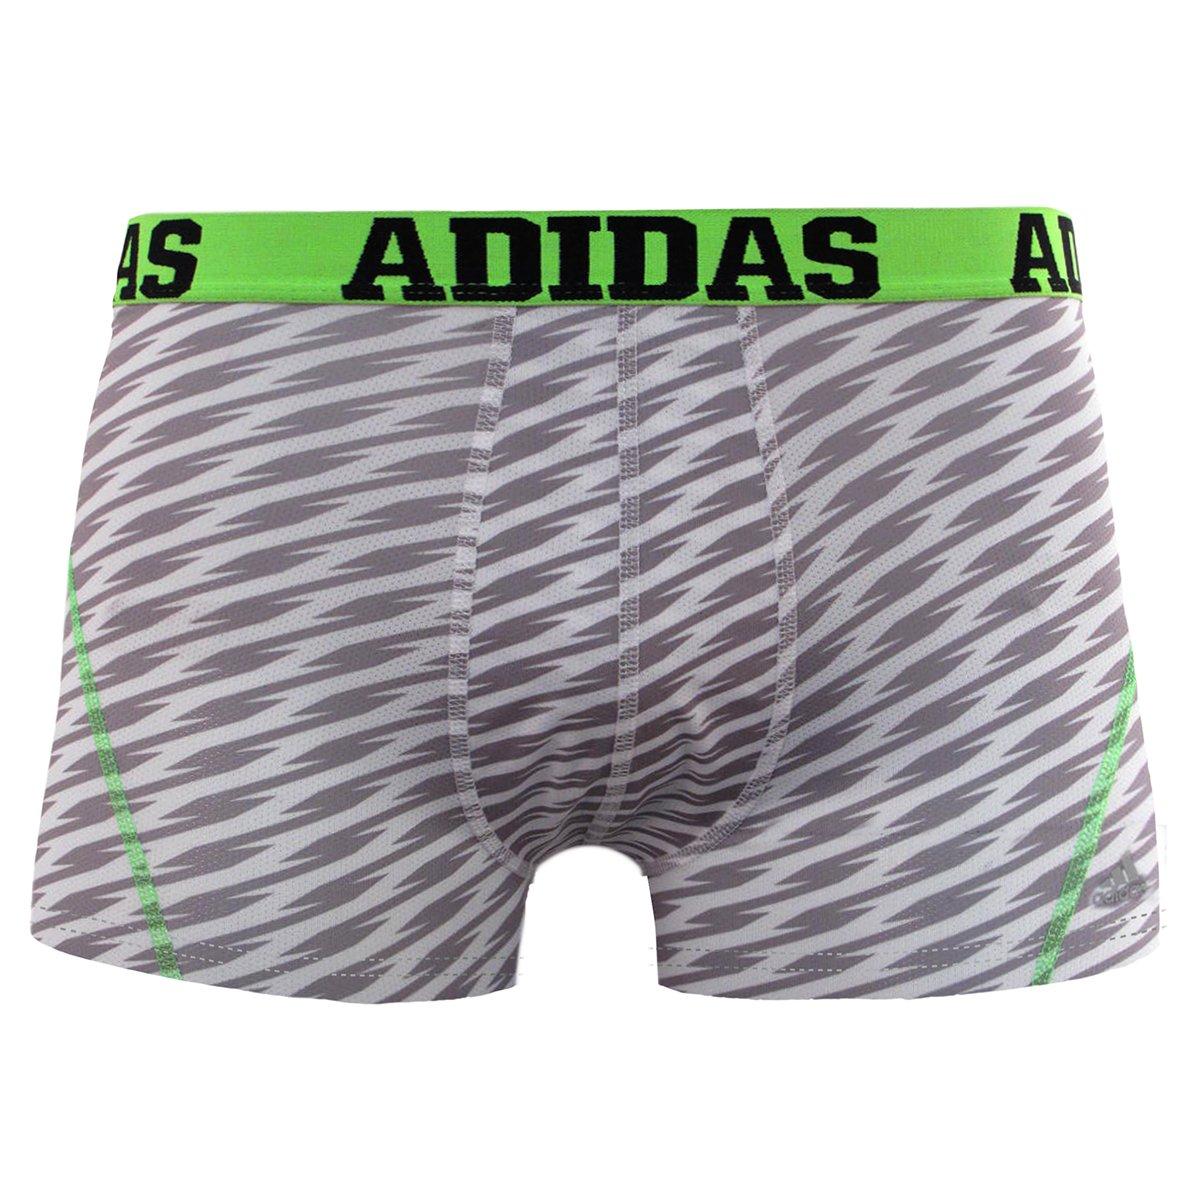 adidas Men's Sport Performance Climacool Graphic Trunk Underwear